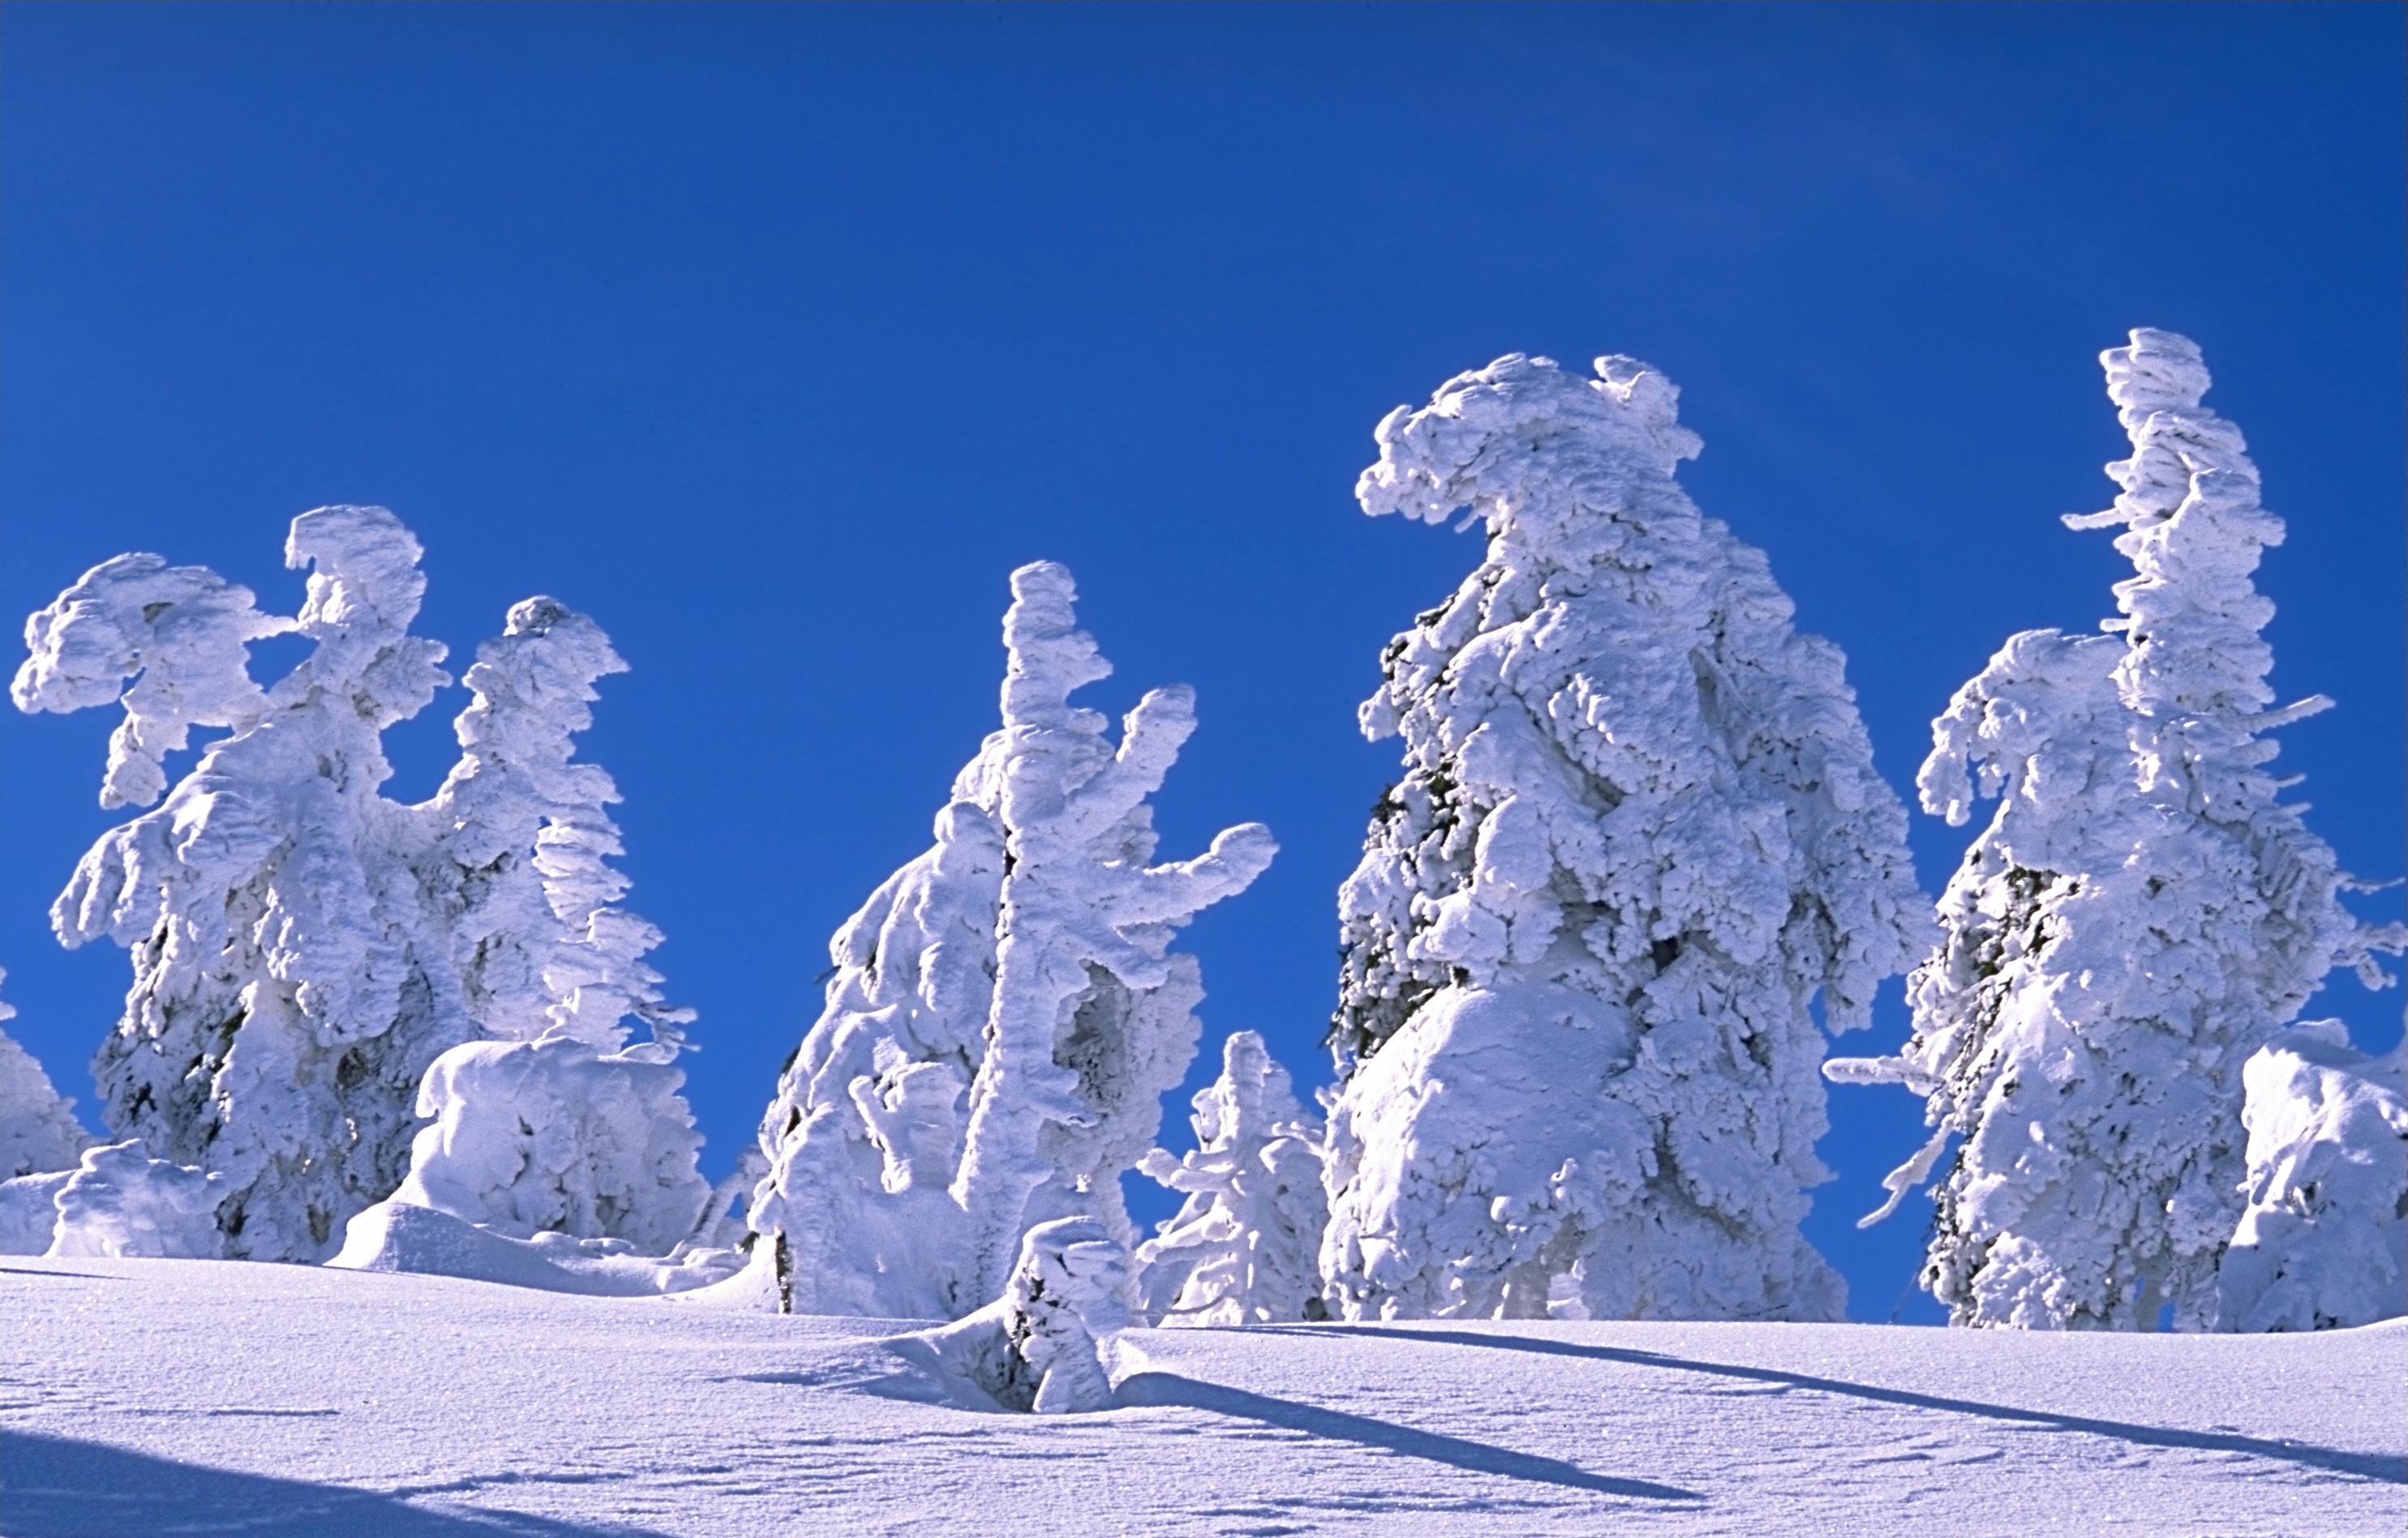 10 odes to beautiful snow now beautifulnow